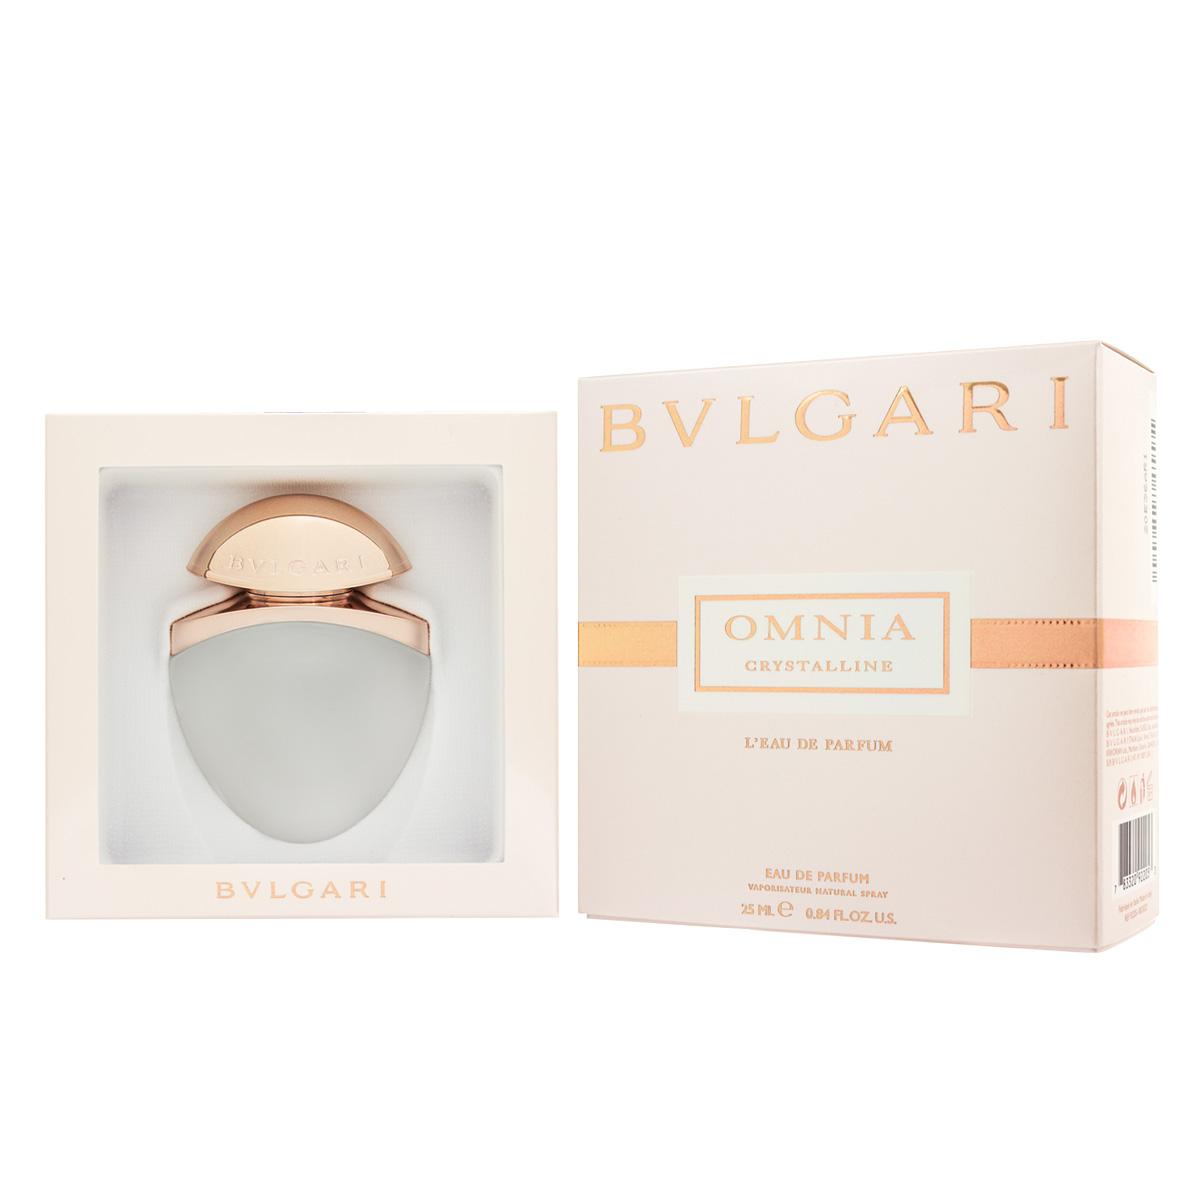 Bvlgari Omnia Crystalline L'Eau de Parfum EDP 25 ml W